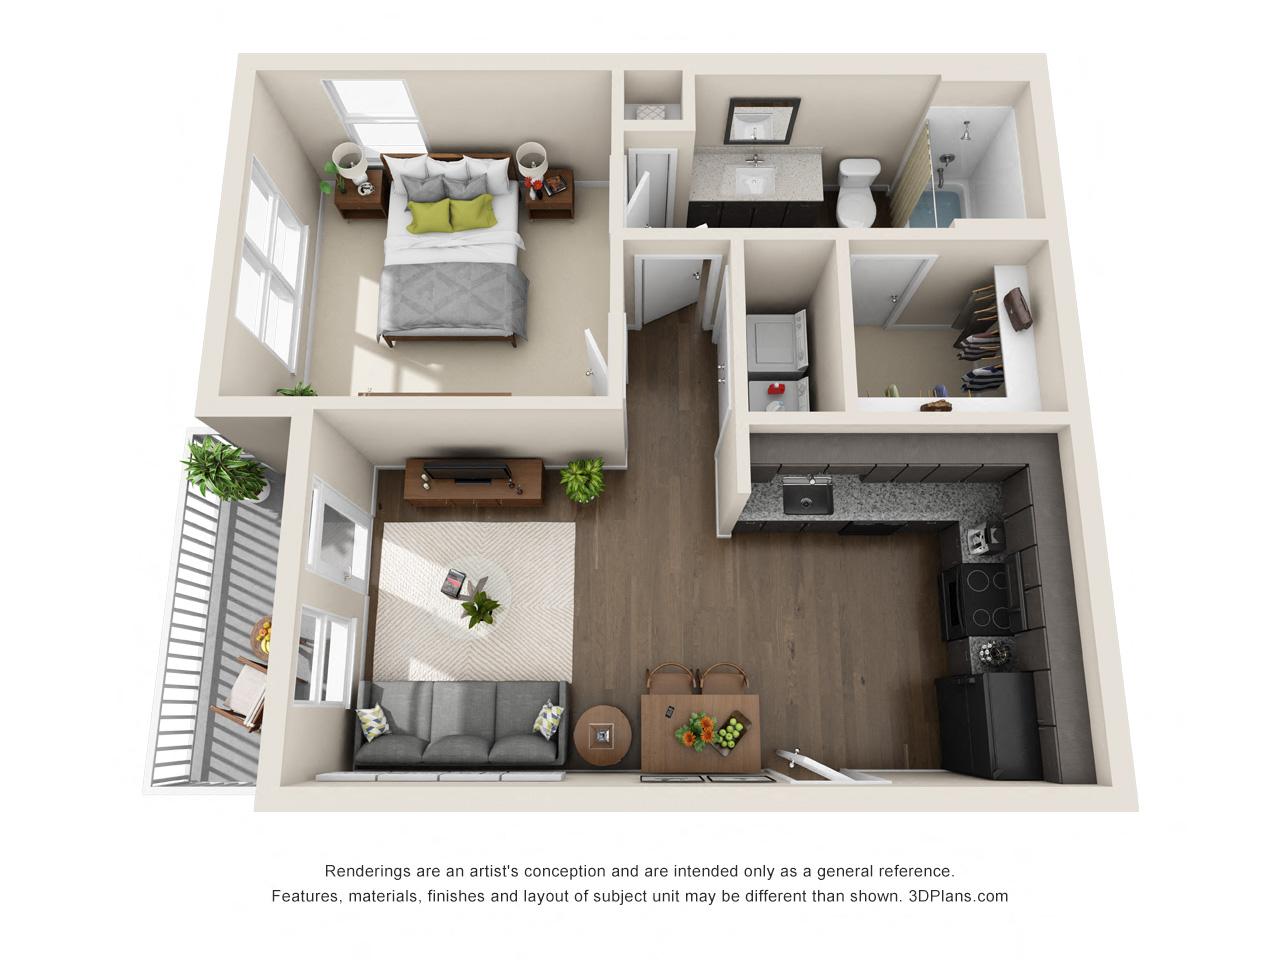 1 2 3 bedroom apartments in san antonio tx viridian - One bedroom apartments san antonio ...